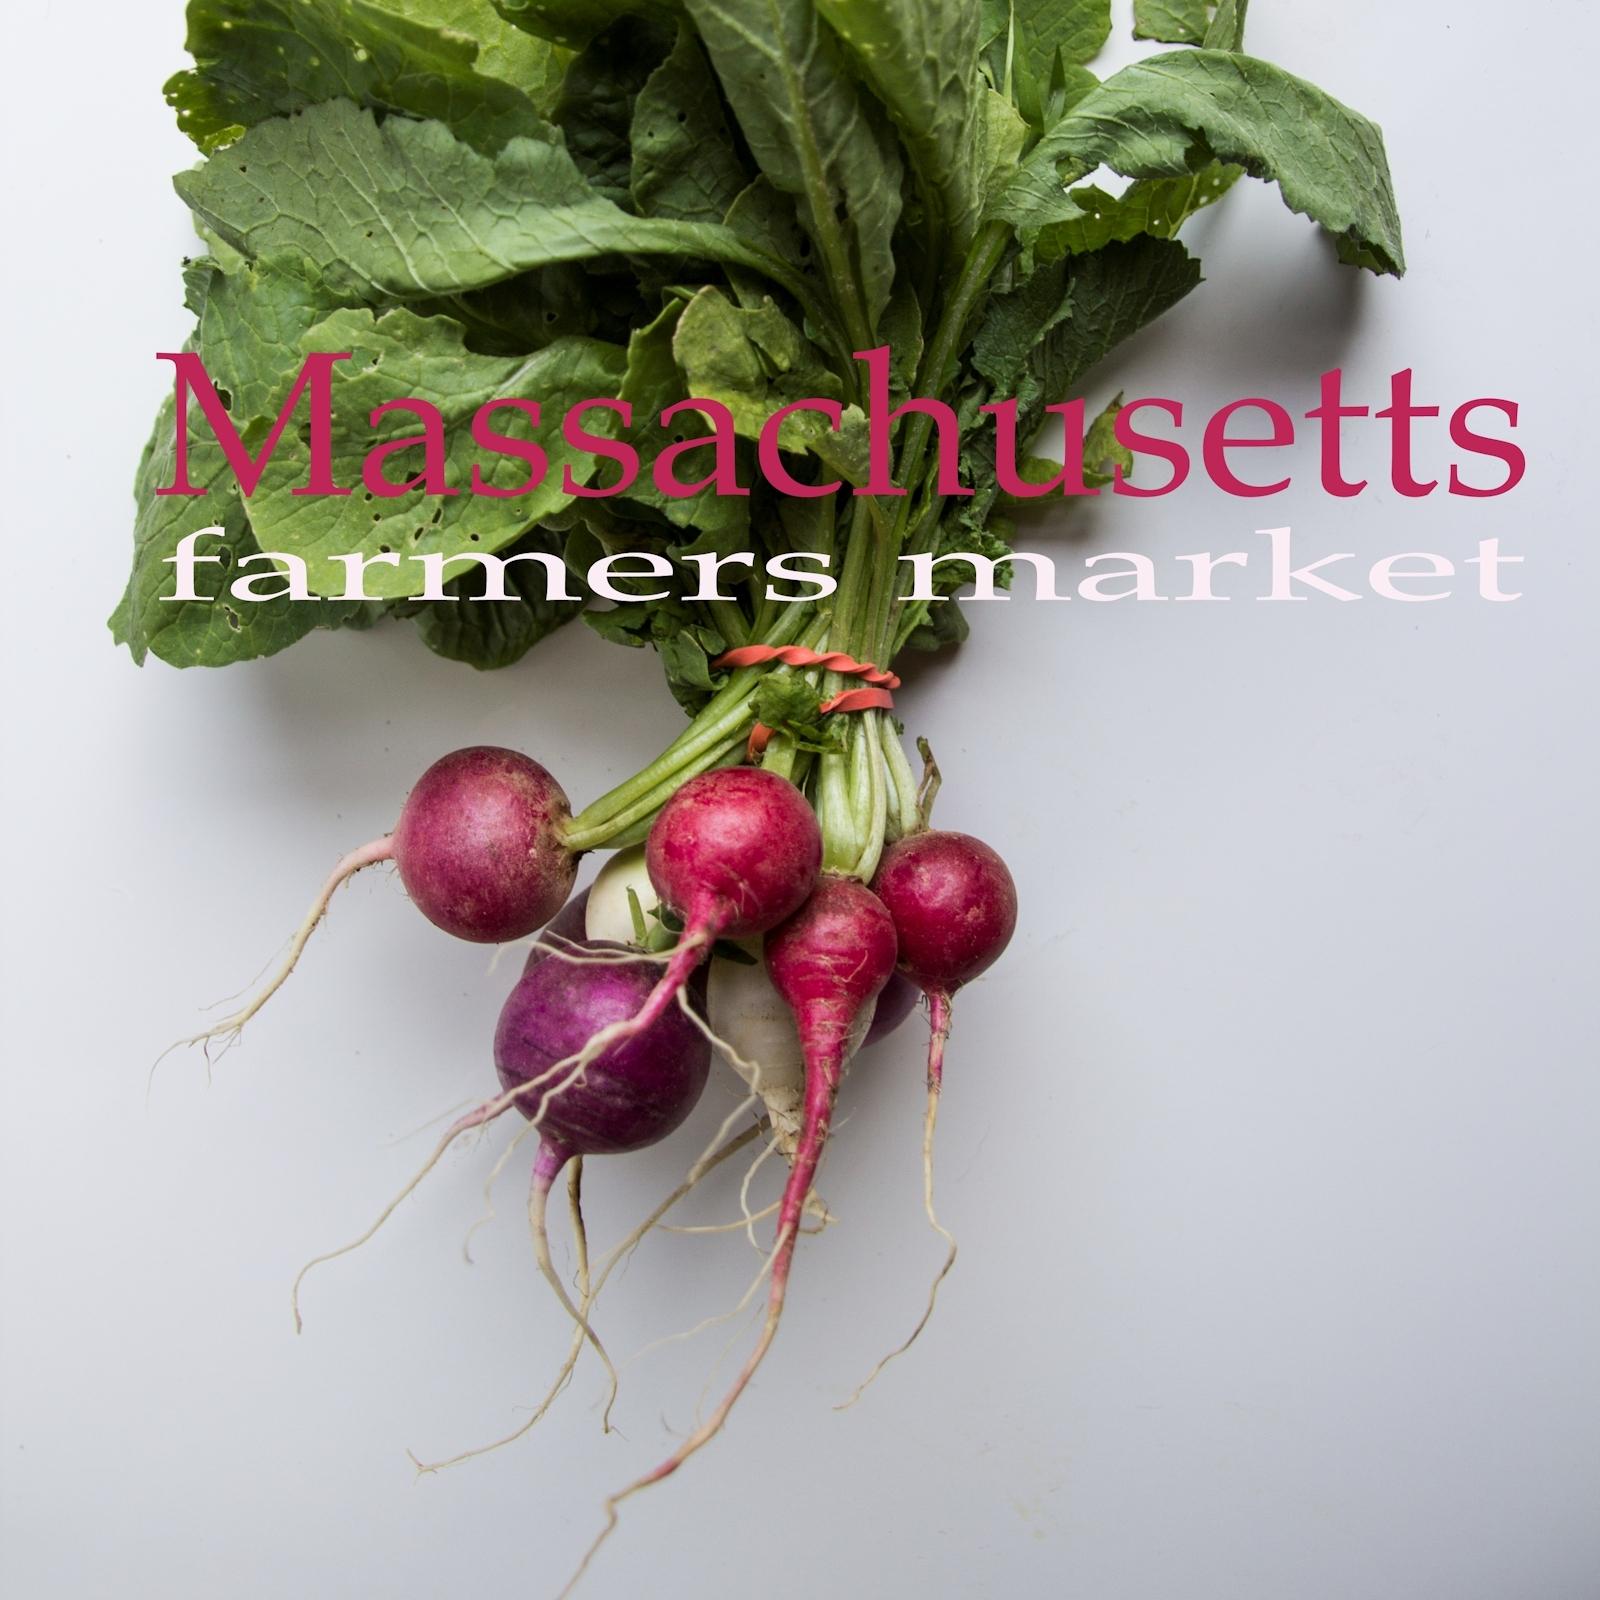 Massachusetts Farmers Markets Square - Radishes